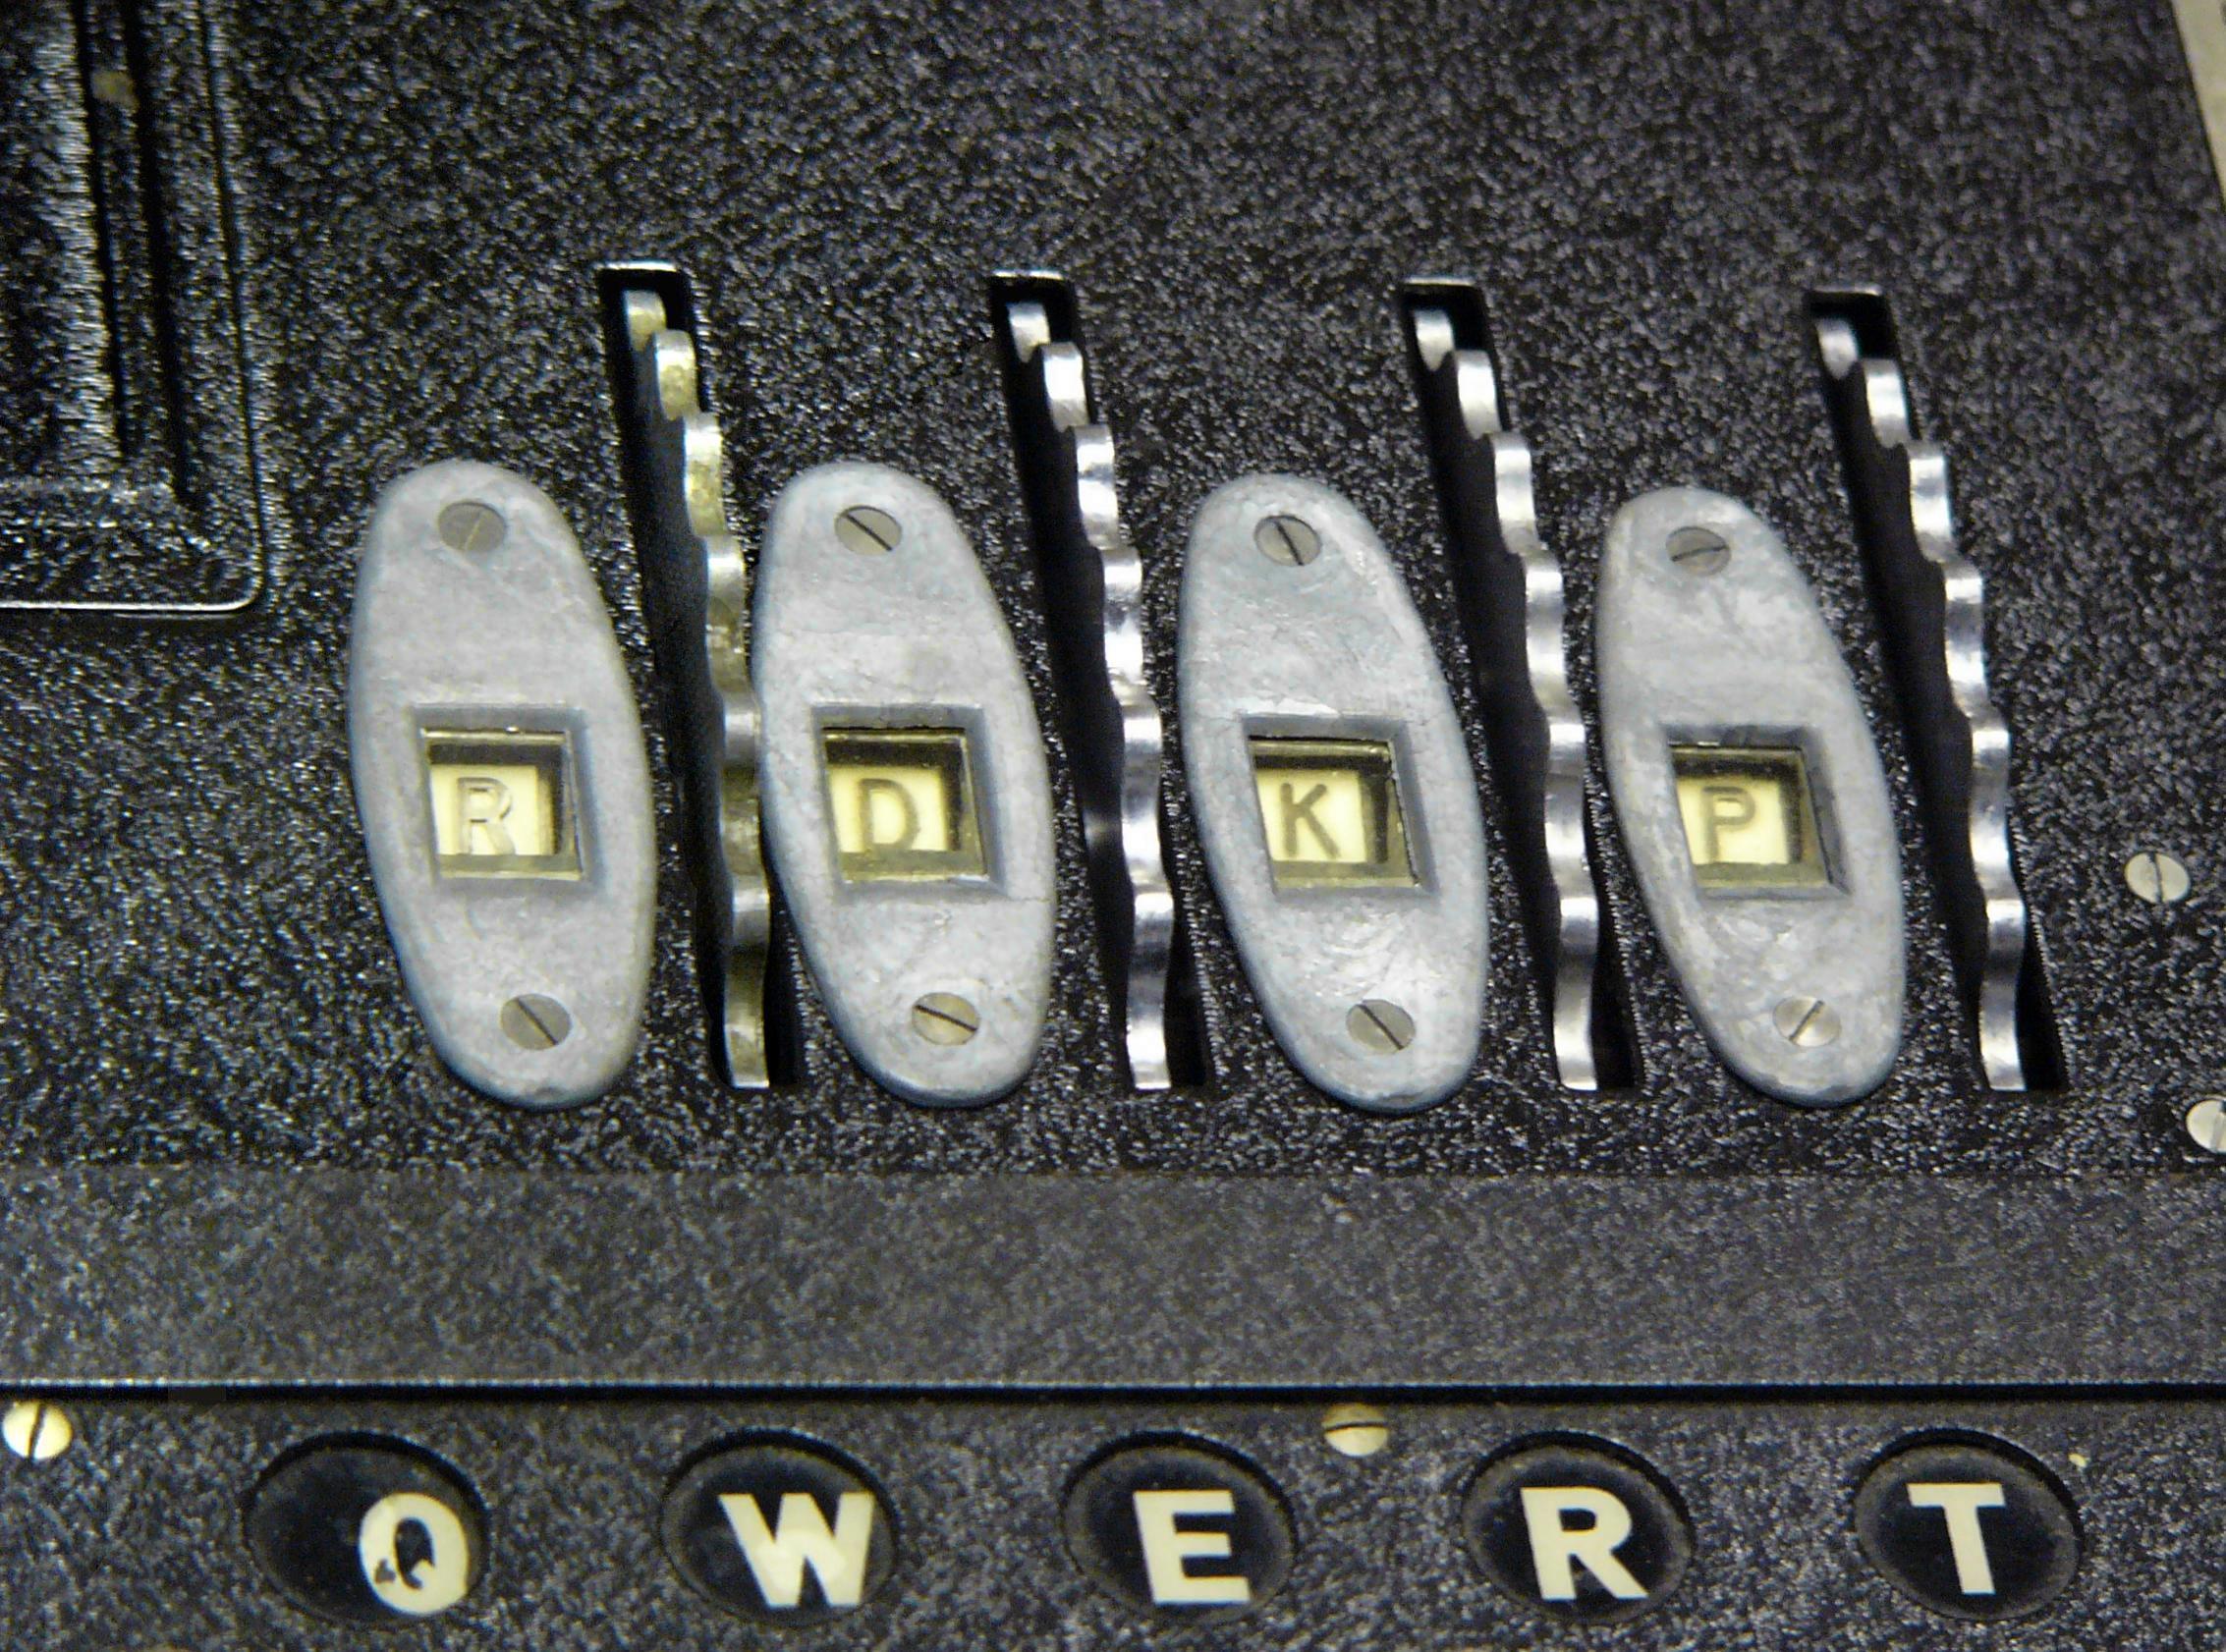 Enigma machine - Military Wiki